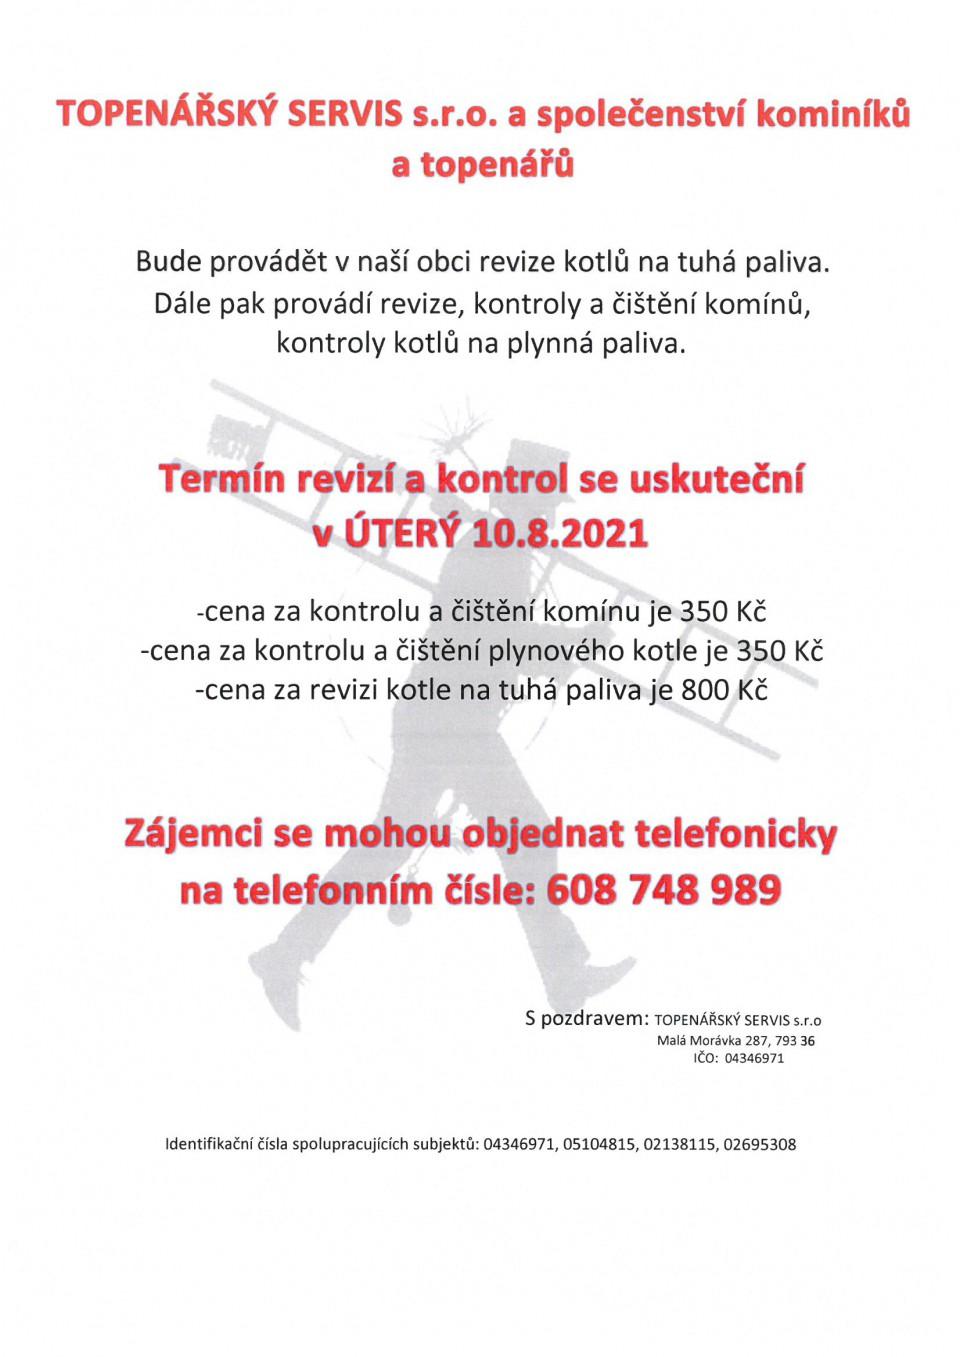 topenarsky-servis-sro-mala-moravka-nabidka